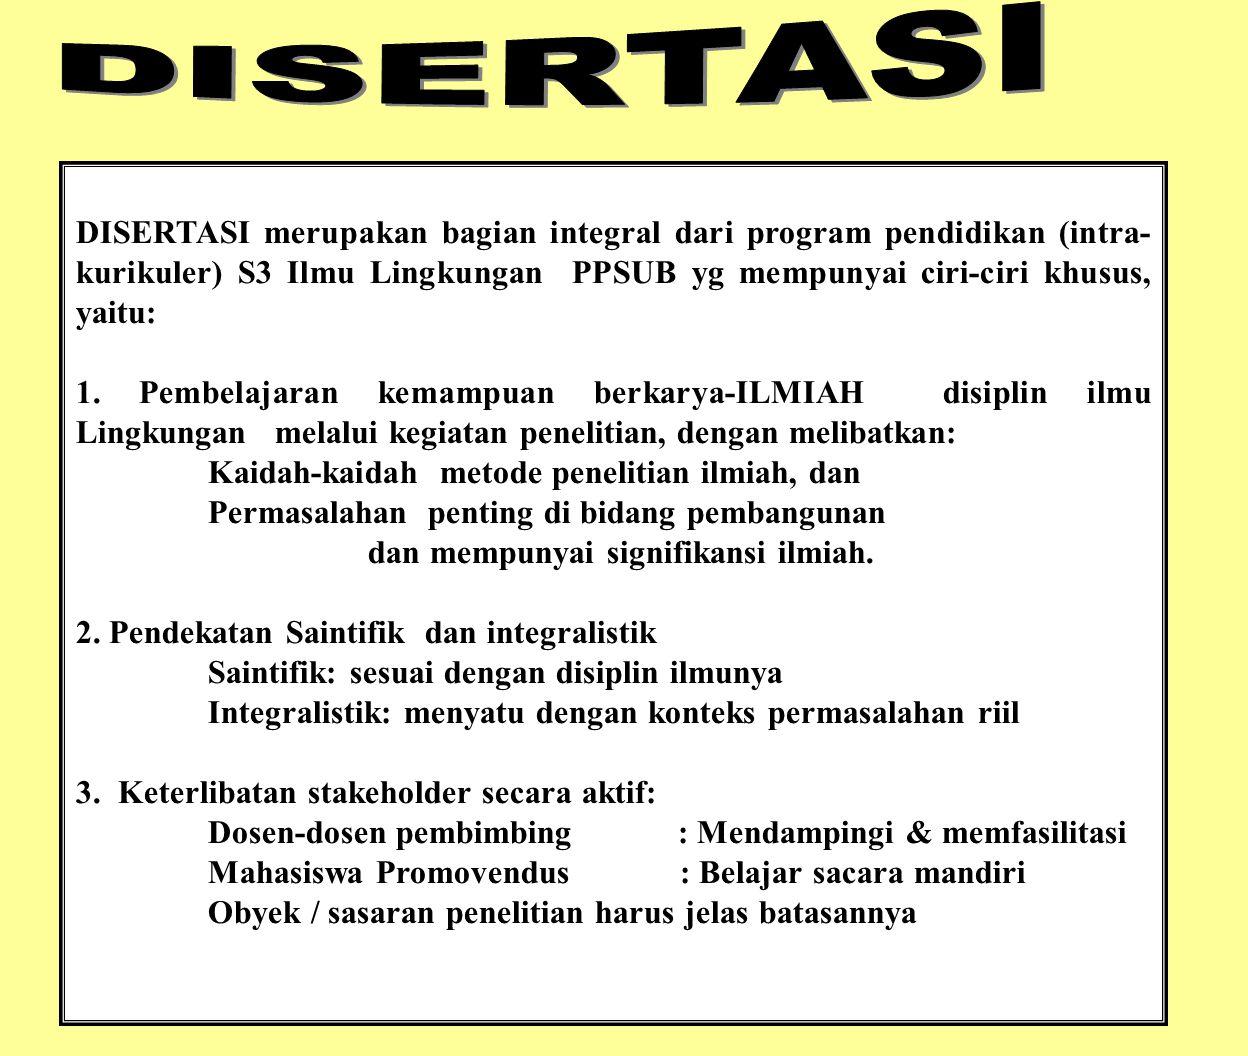 DISERTASI merupakan bagian integral dari program pendidikan (intra- kurikuler) S3 Ilmu Lingkungan PPSUB yg mempunyai ciri-ciri khusus, yaitu: 1. Pembe